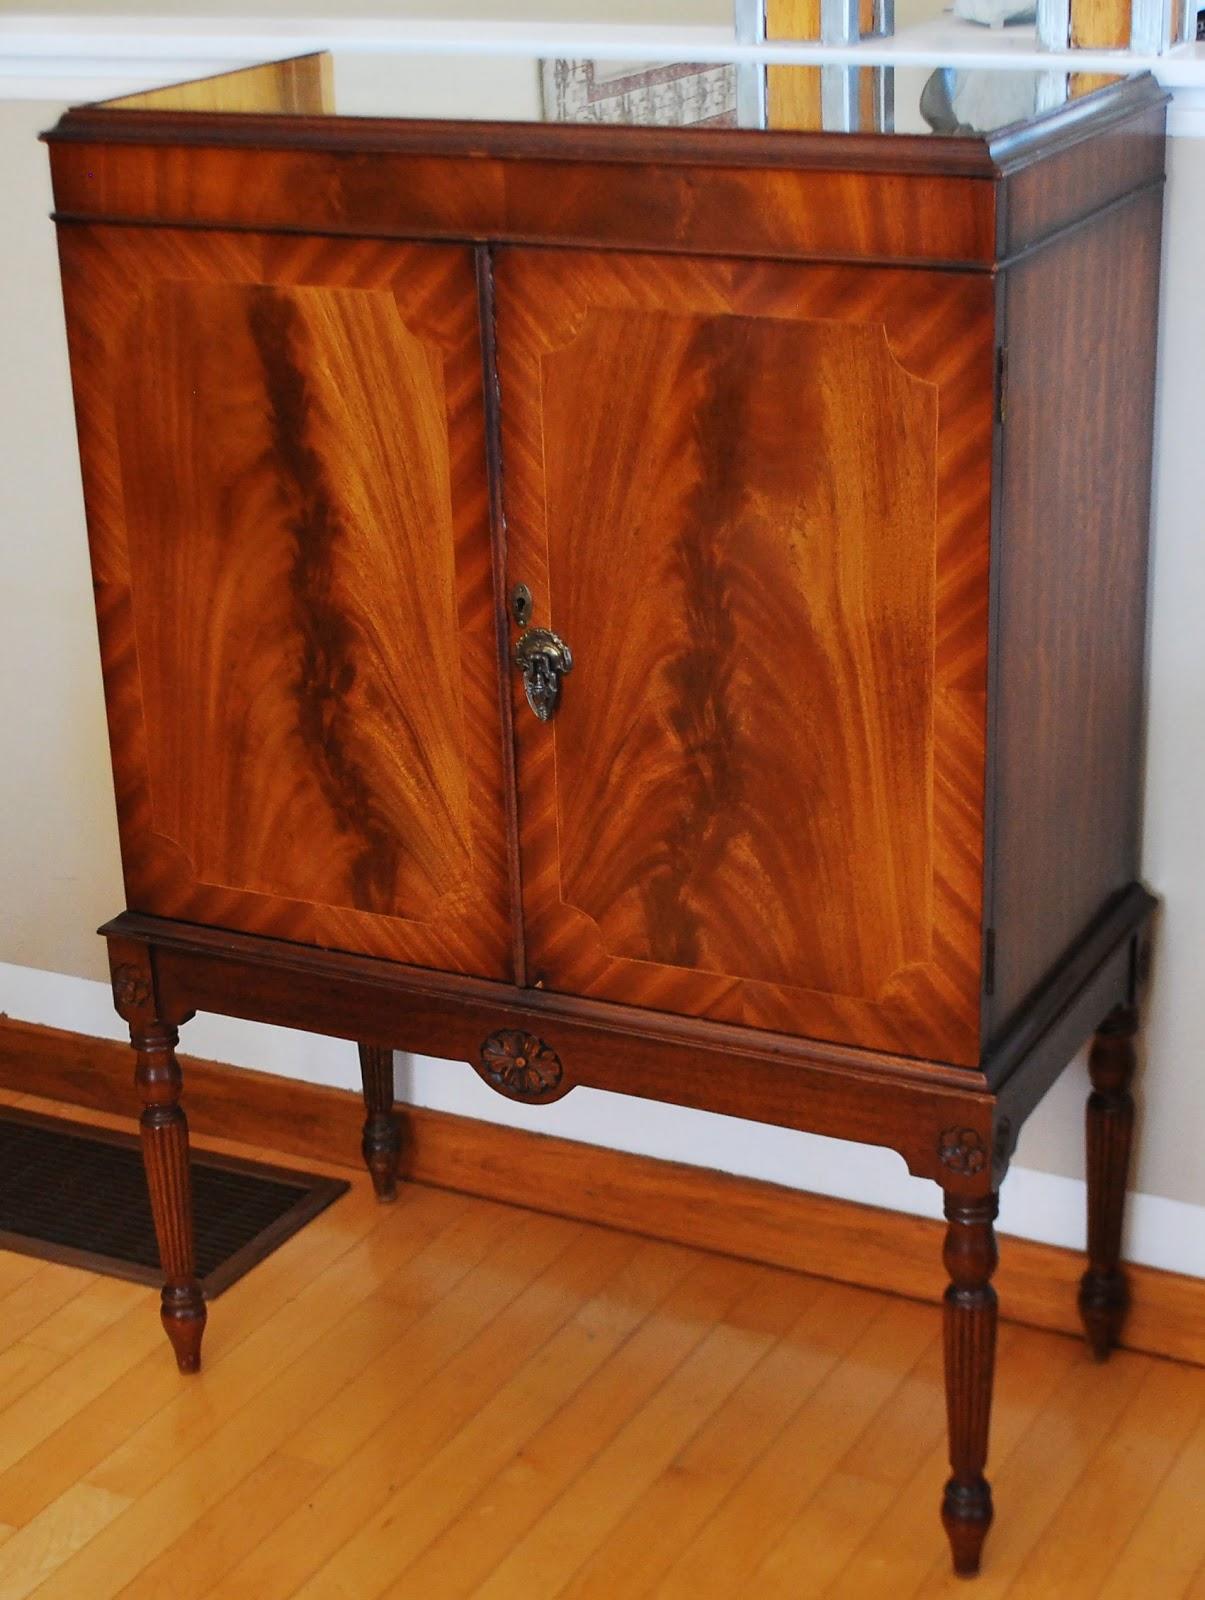 Tribute 20th Decor: Mahogany Liquor Cabinet